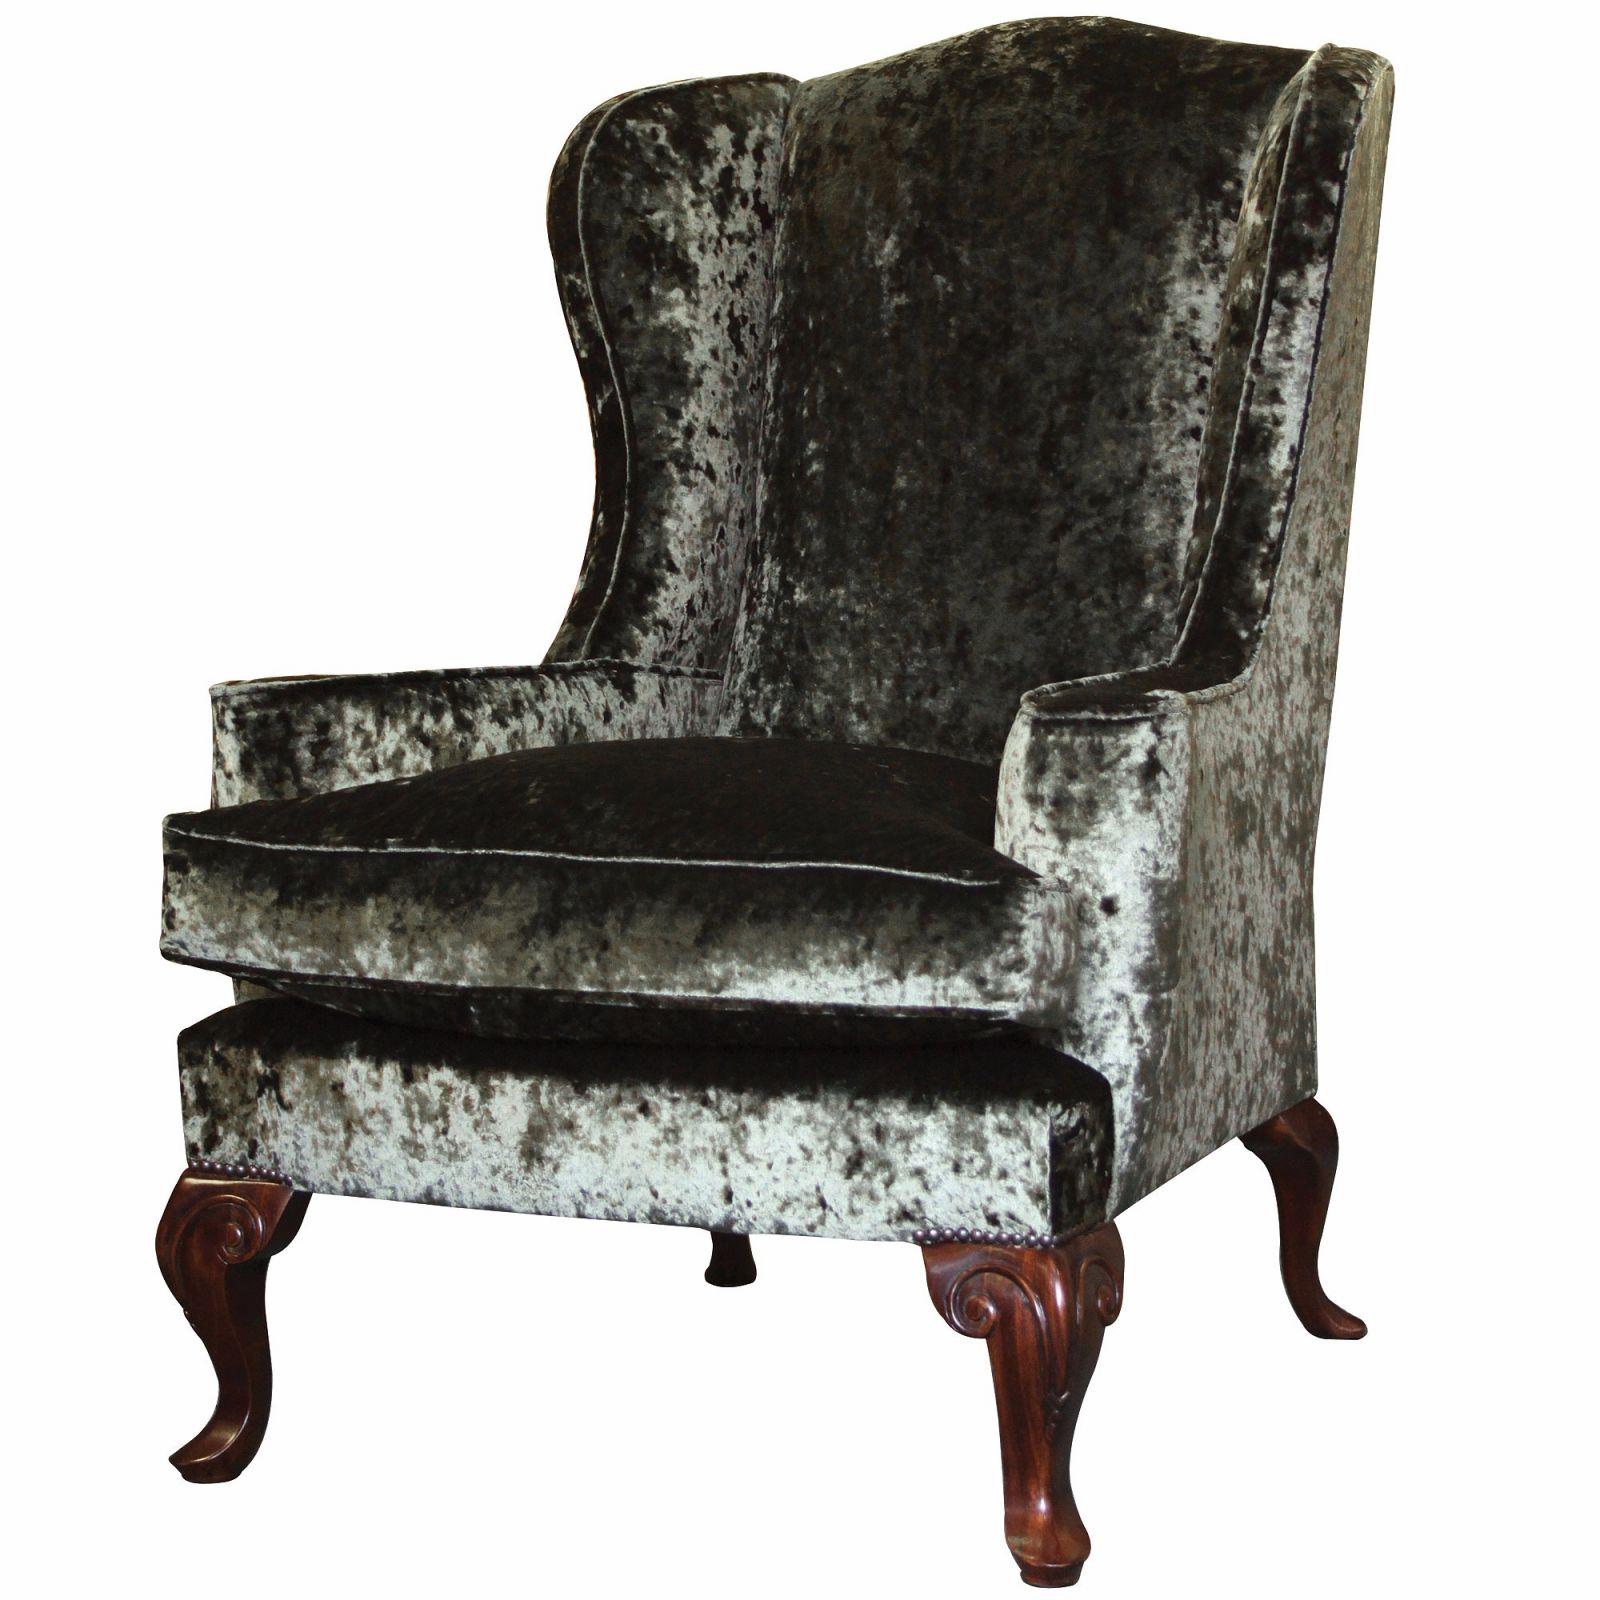 Melbury wing chair in Emerald velvet